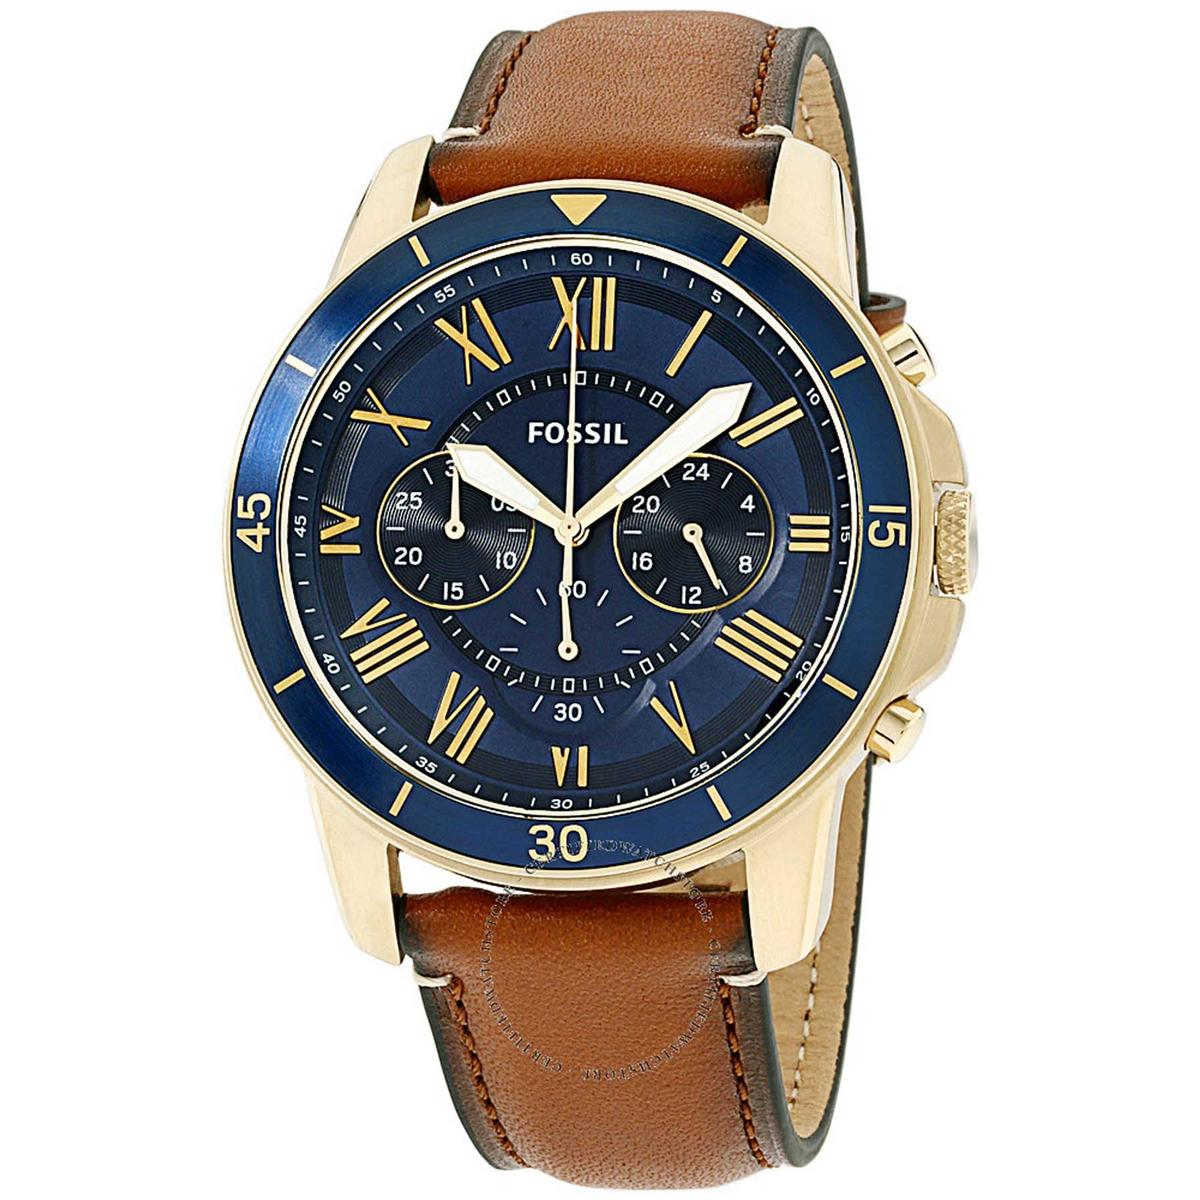 9eab106f971 Relógio Fossil Grant Cronógrafo Analógico Masculino FS5268 2AN Produto não  disponível